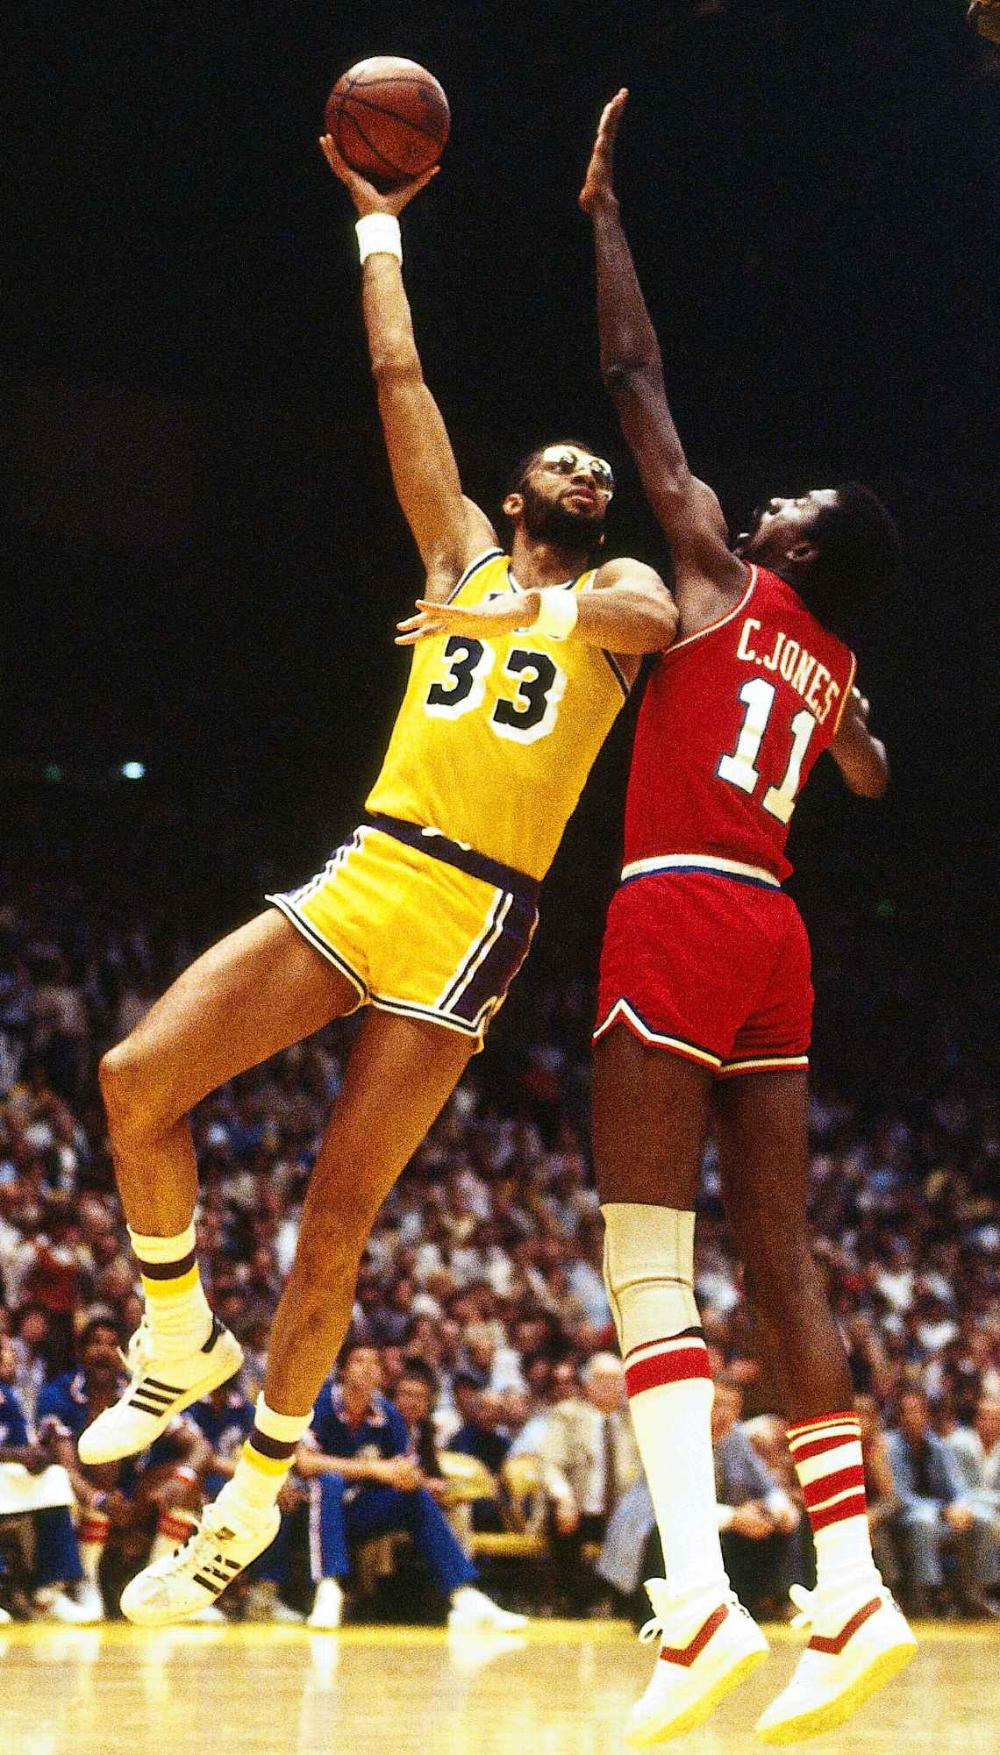 Pin By Richard Geer On Lakers Kareem Abdul Jabbar Los Angeles Lakers Nike Air Max 2011